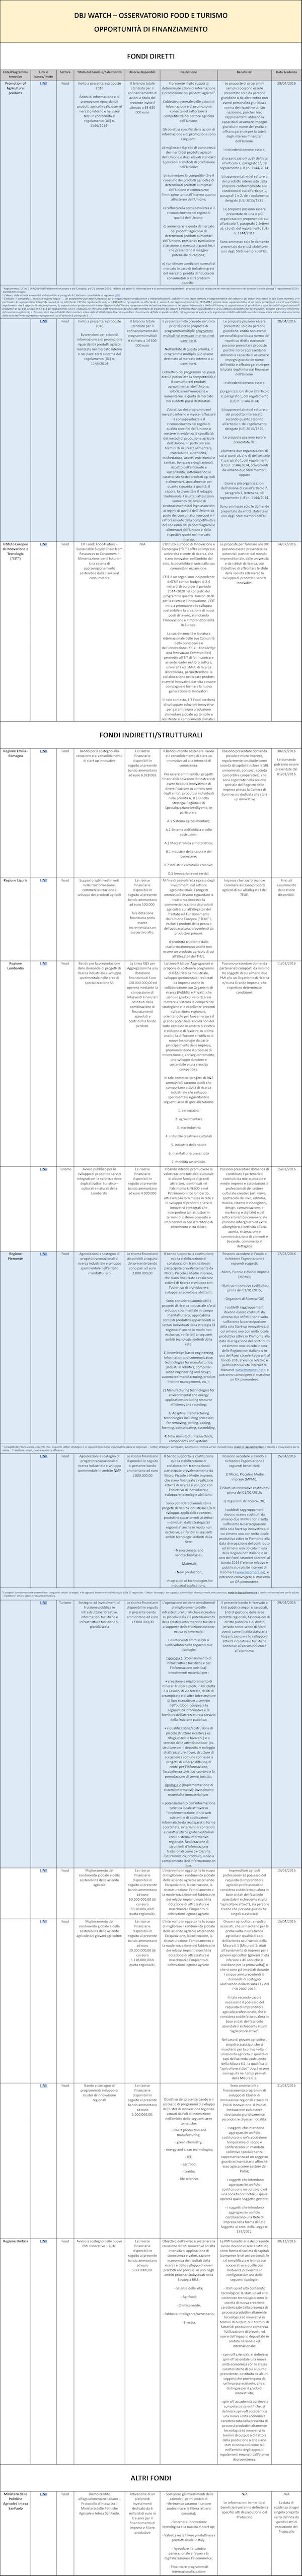 fondi strutturali aggiornati_1